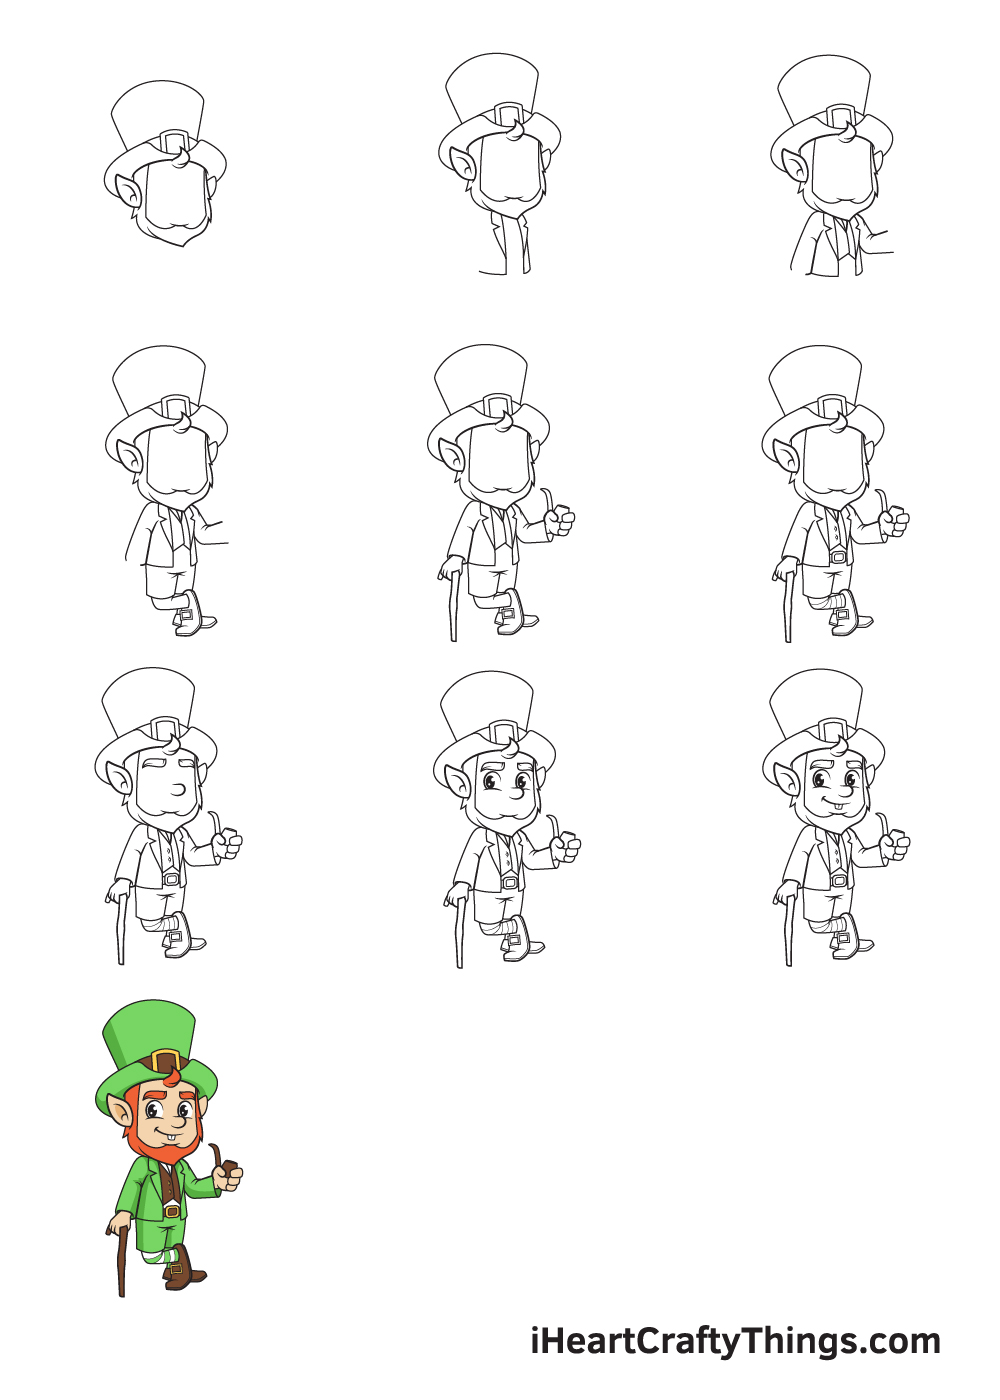 Drawing Leprechaun in 9 Easy Steps